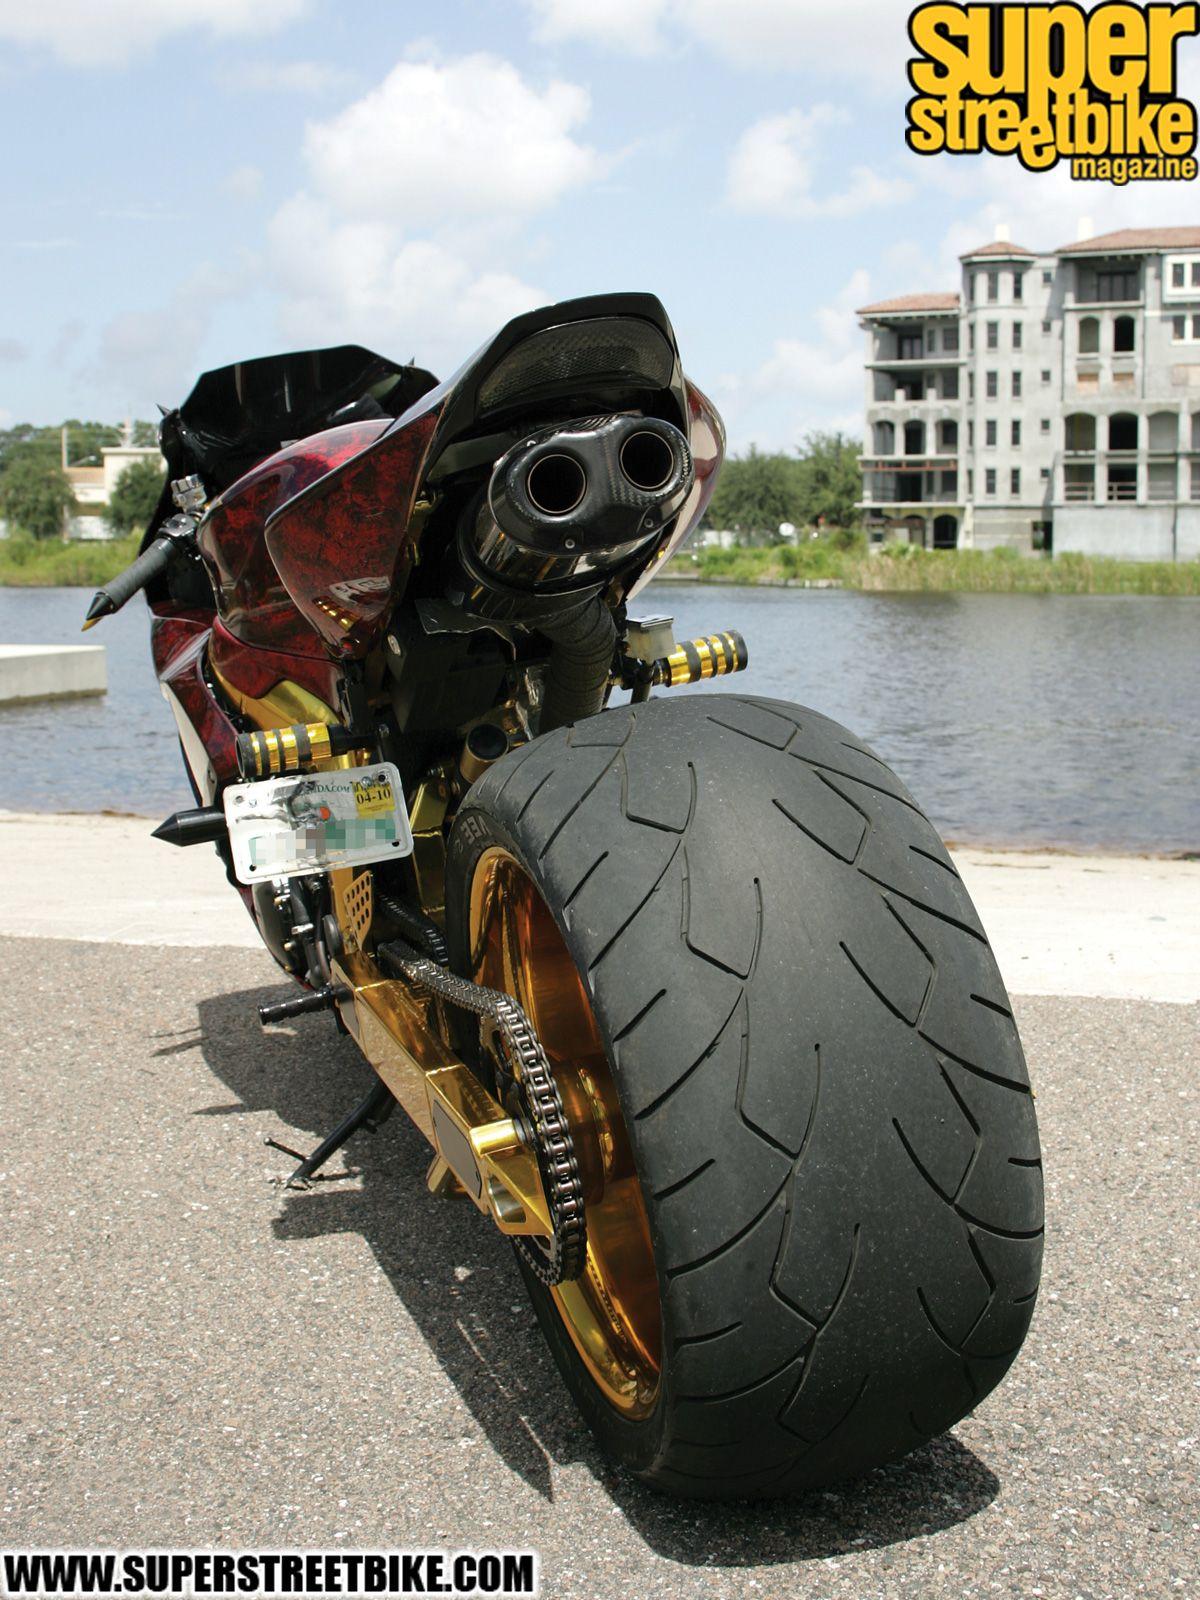 2006 Honda Cbr1000rr Tuning 1 Hot Honda Motorcycle и Bike Life